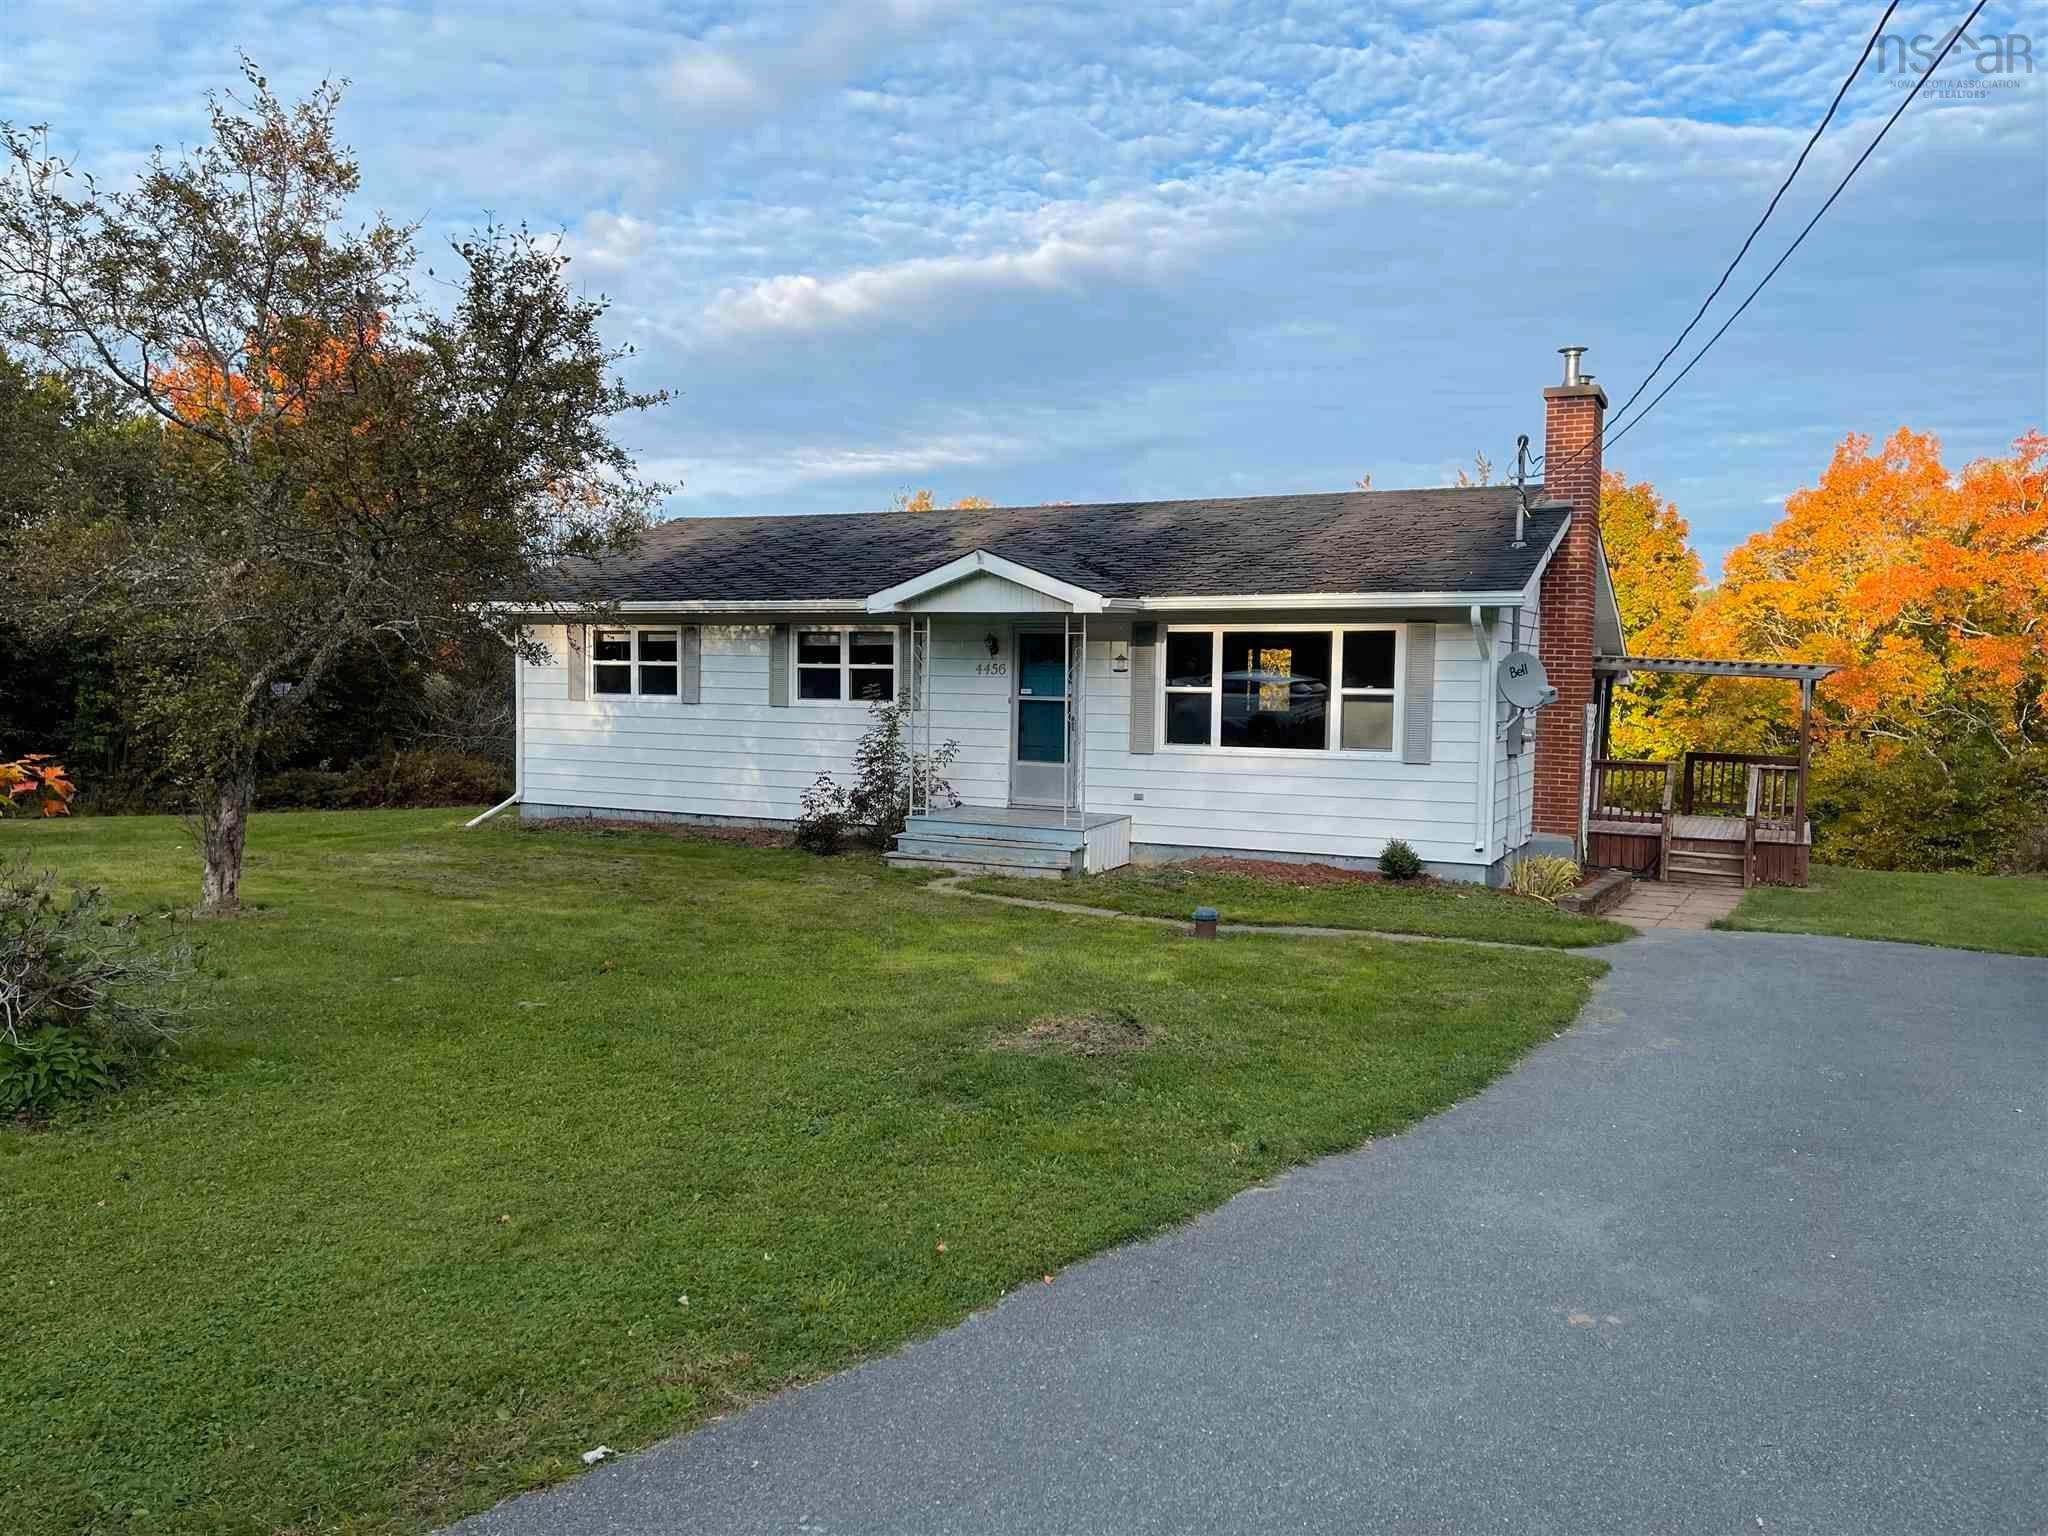 Main Photo: 4456 Stellarton Trafalgar Road in Hopewell: 108-Rural Pictou County Residential for sale (Northern Region)  : MLS®# 202125877